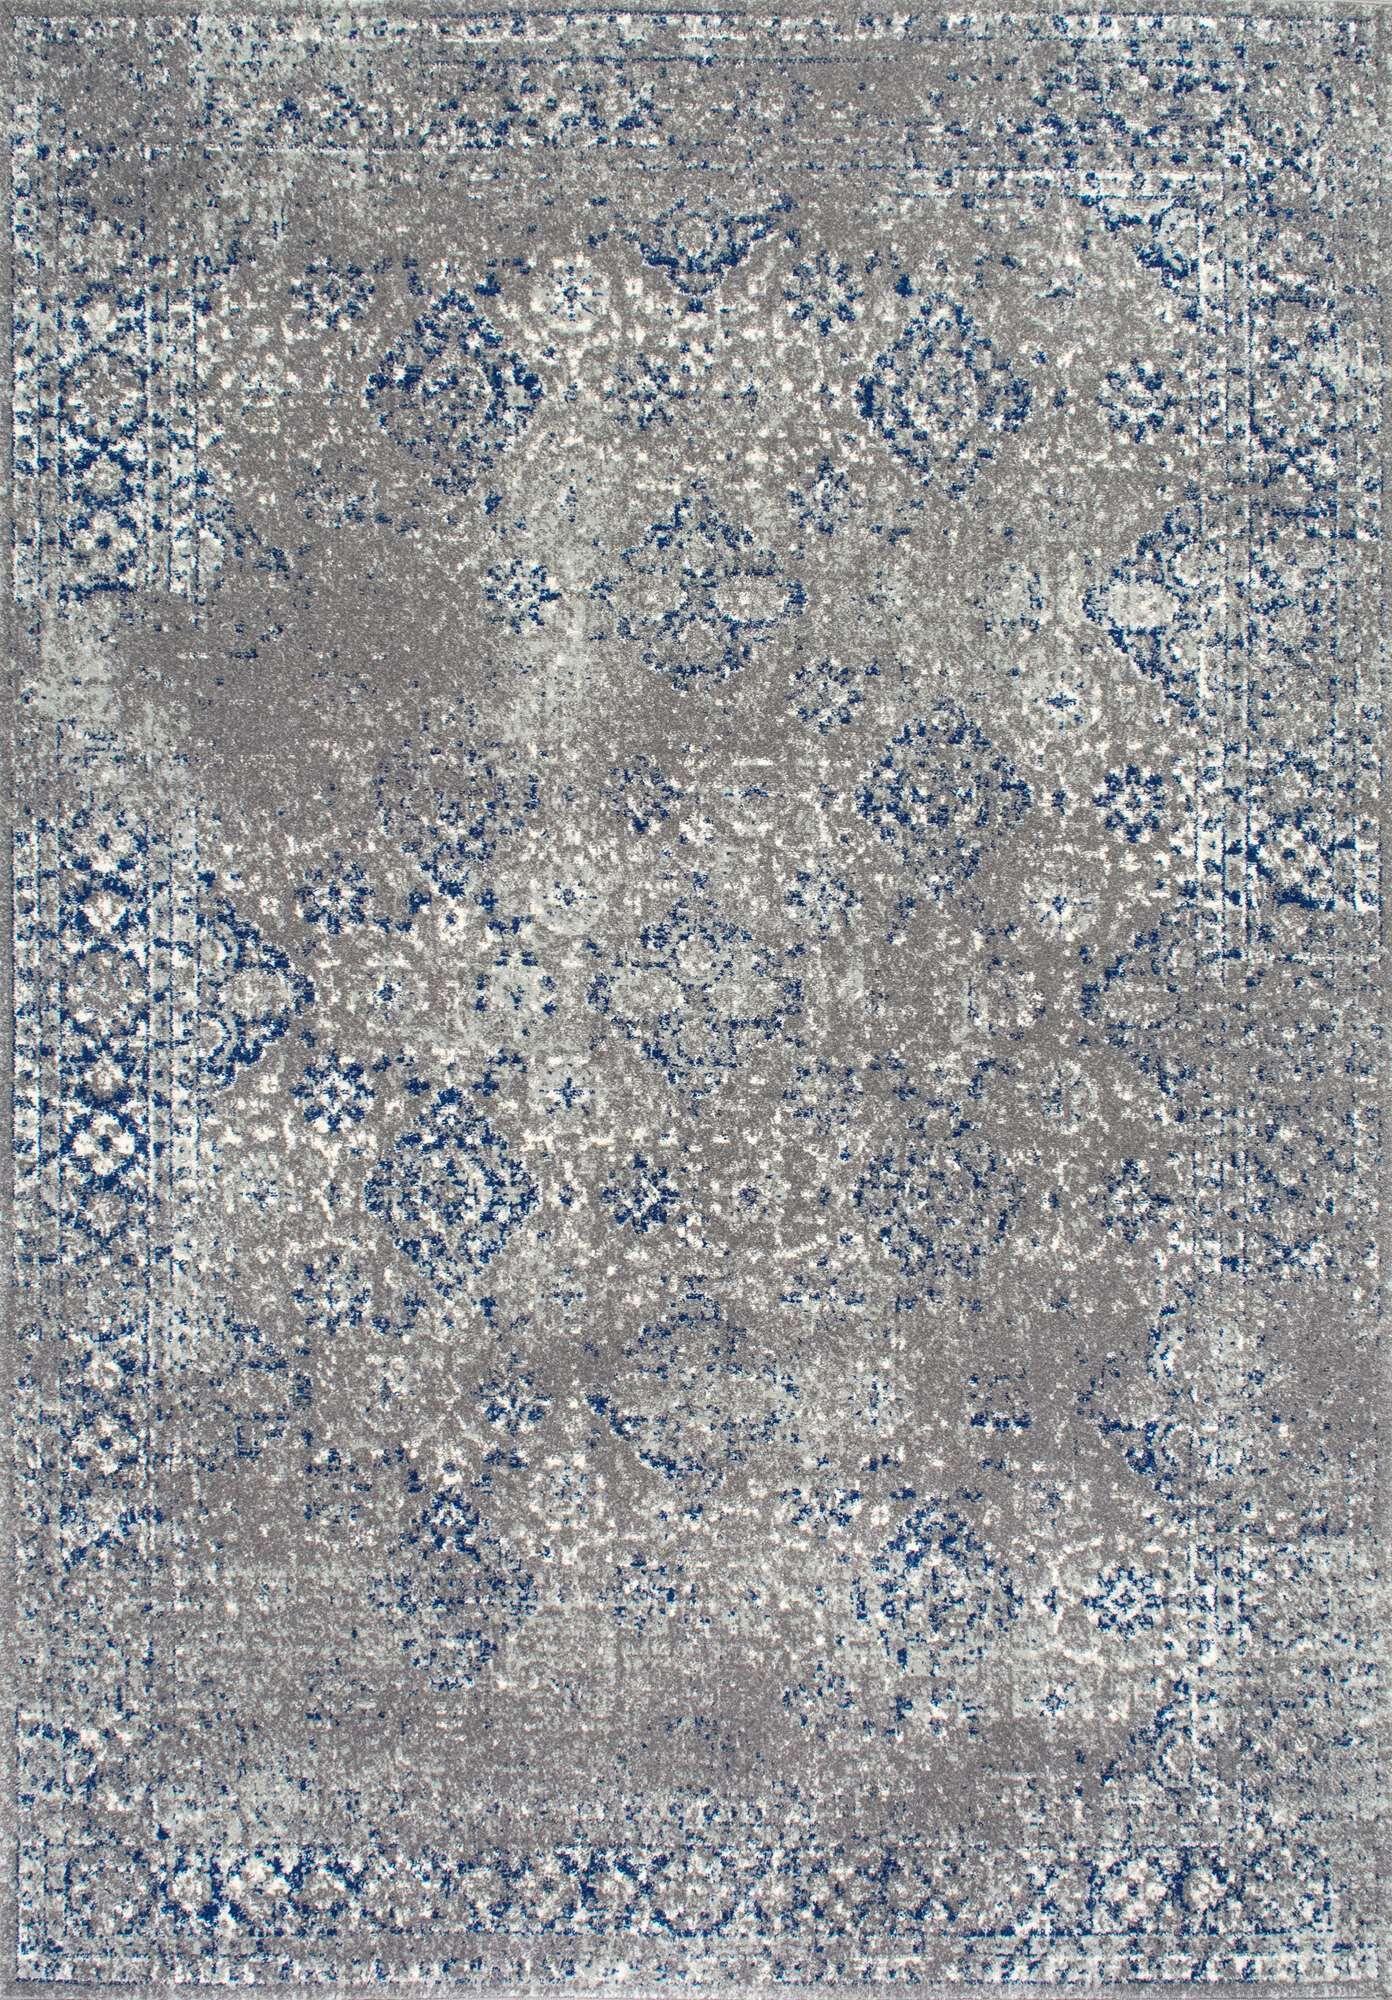 Avallon Faded Dark Blue Area Rug Rug Size: Rectangle 9' x 12'